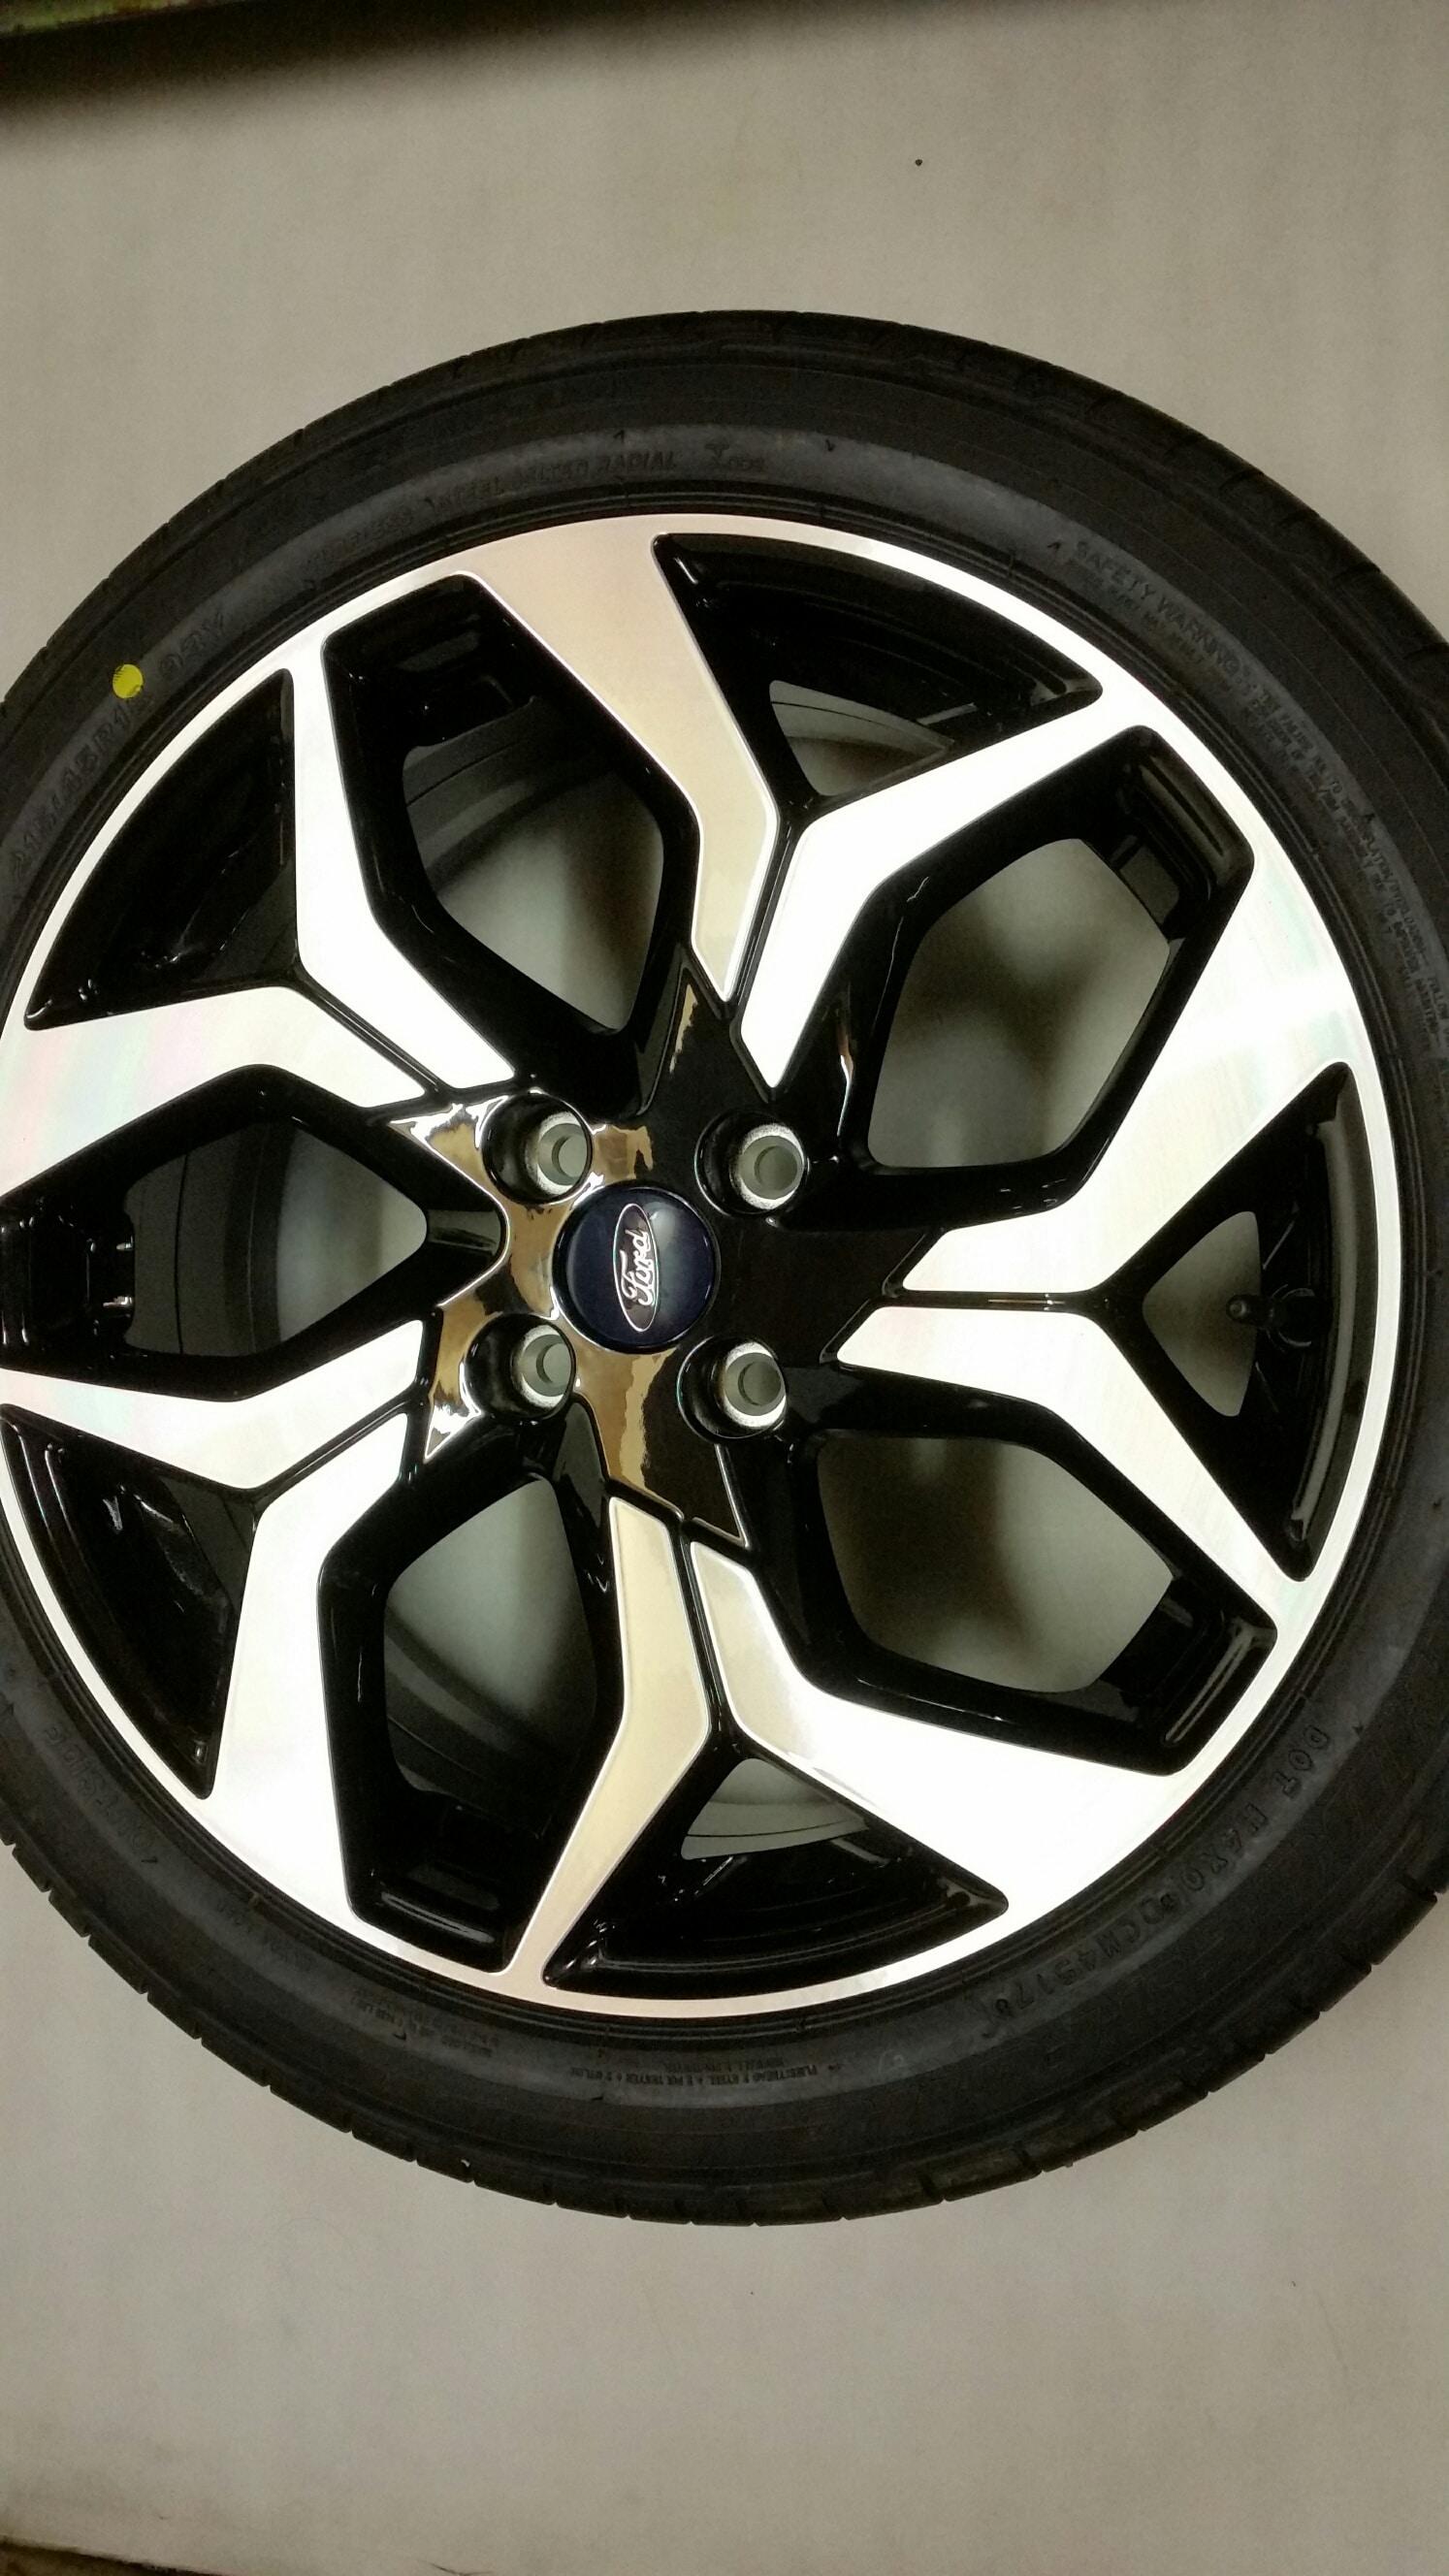 Originele Ford Ecosport Lichtmetalen Velgen 18 Inch Met Banden